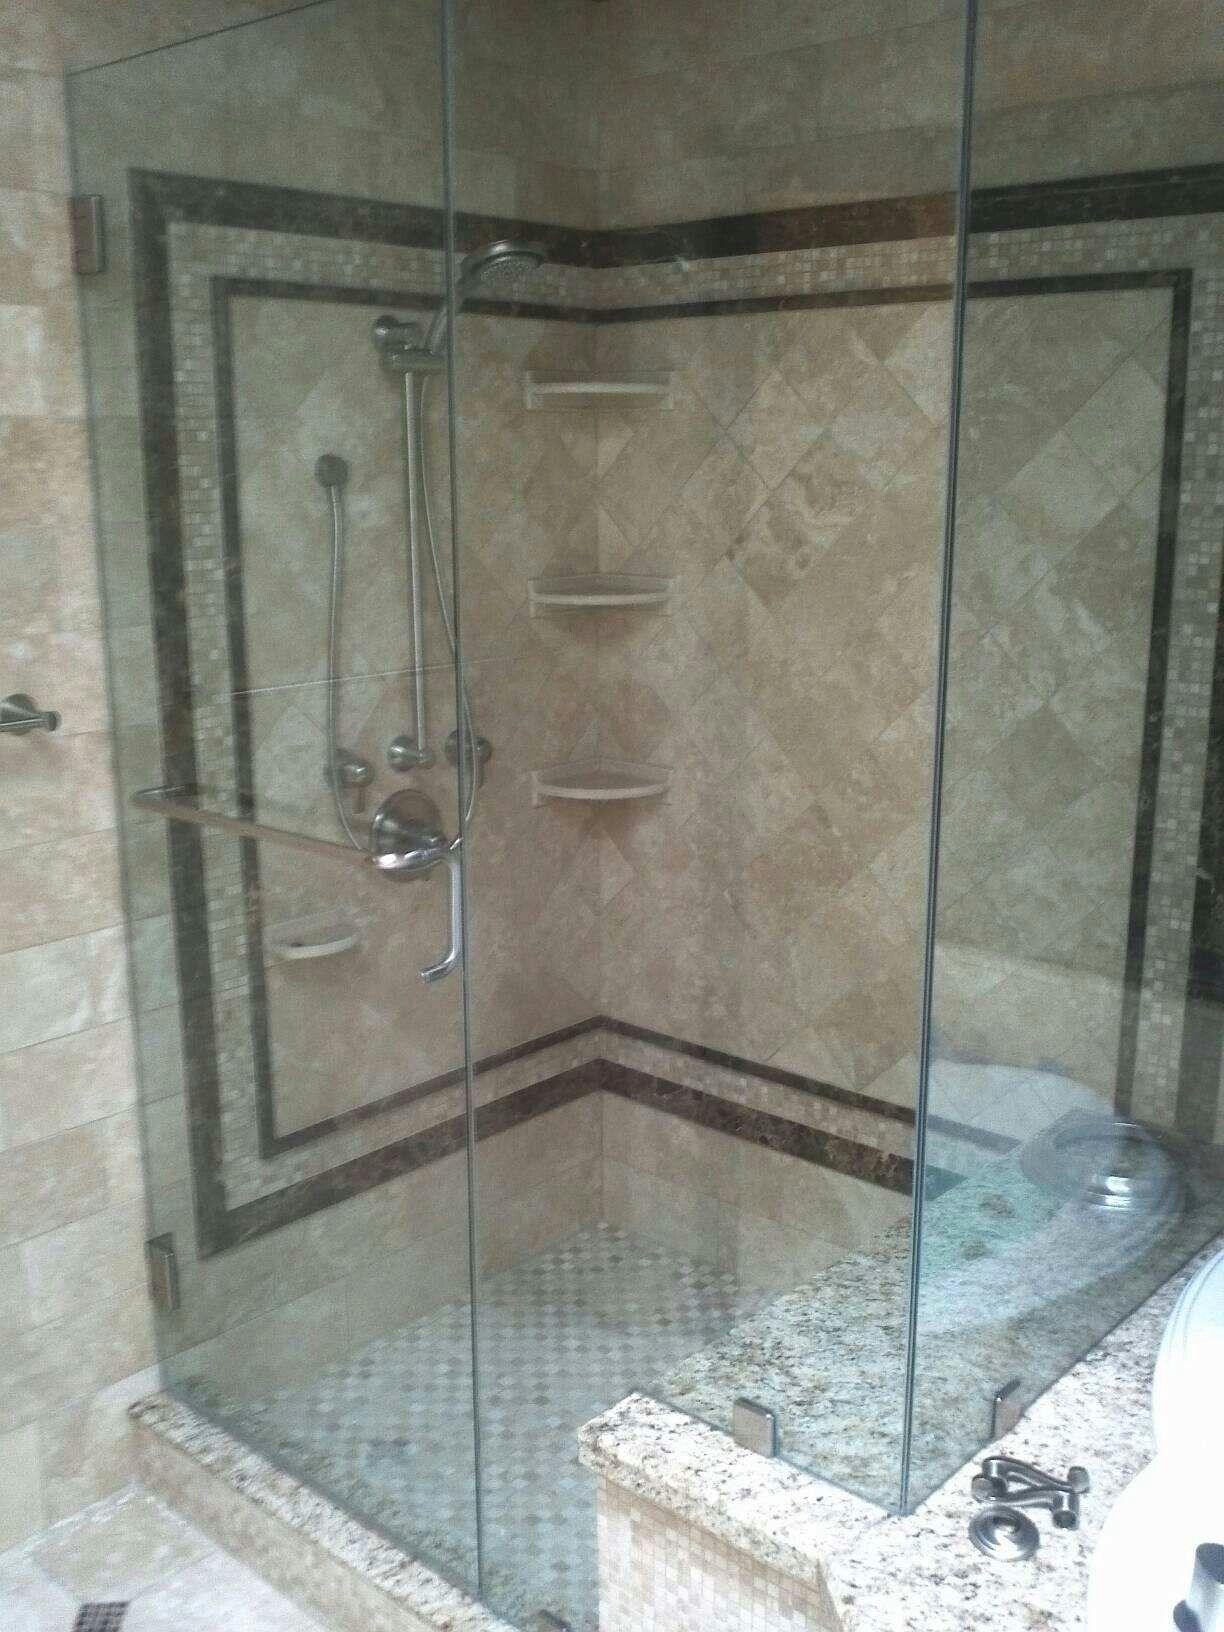 Steve's bathroom remodeling contractor, Round Rock, Texas